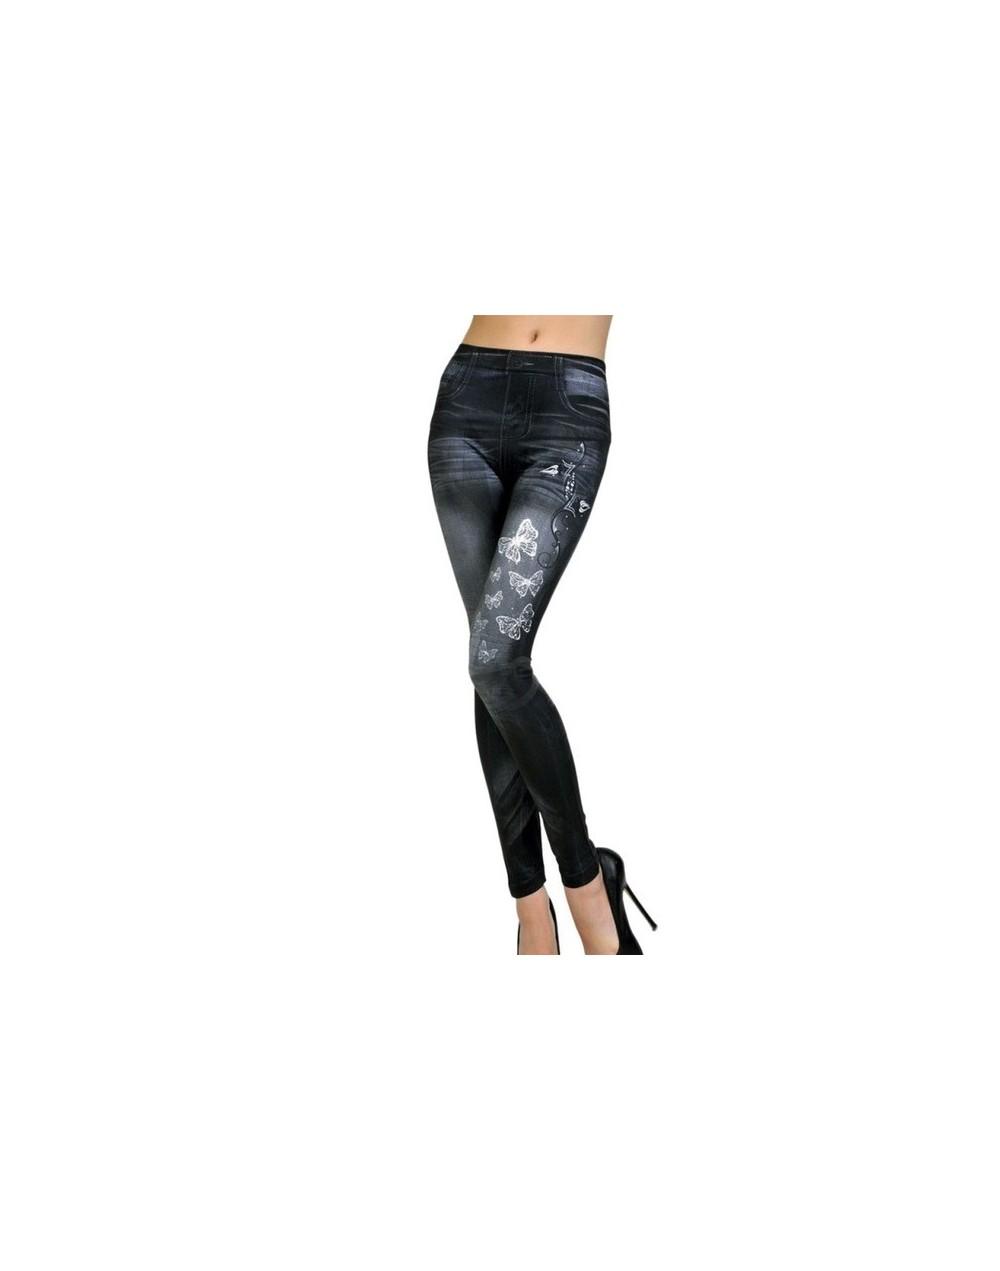 Sexy Stretchy Slim Leggings Women Denim Jeggins Skinny Embroidery Butterfly/Stars Denim Pants - Butterfly black - 4730888344...